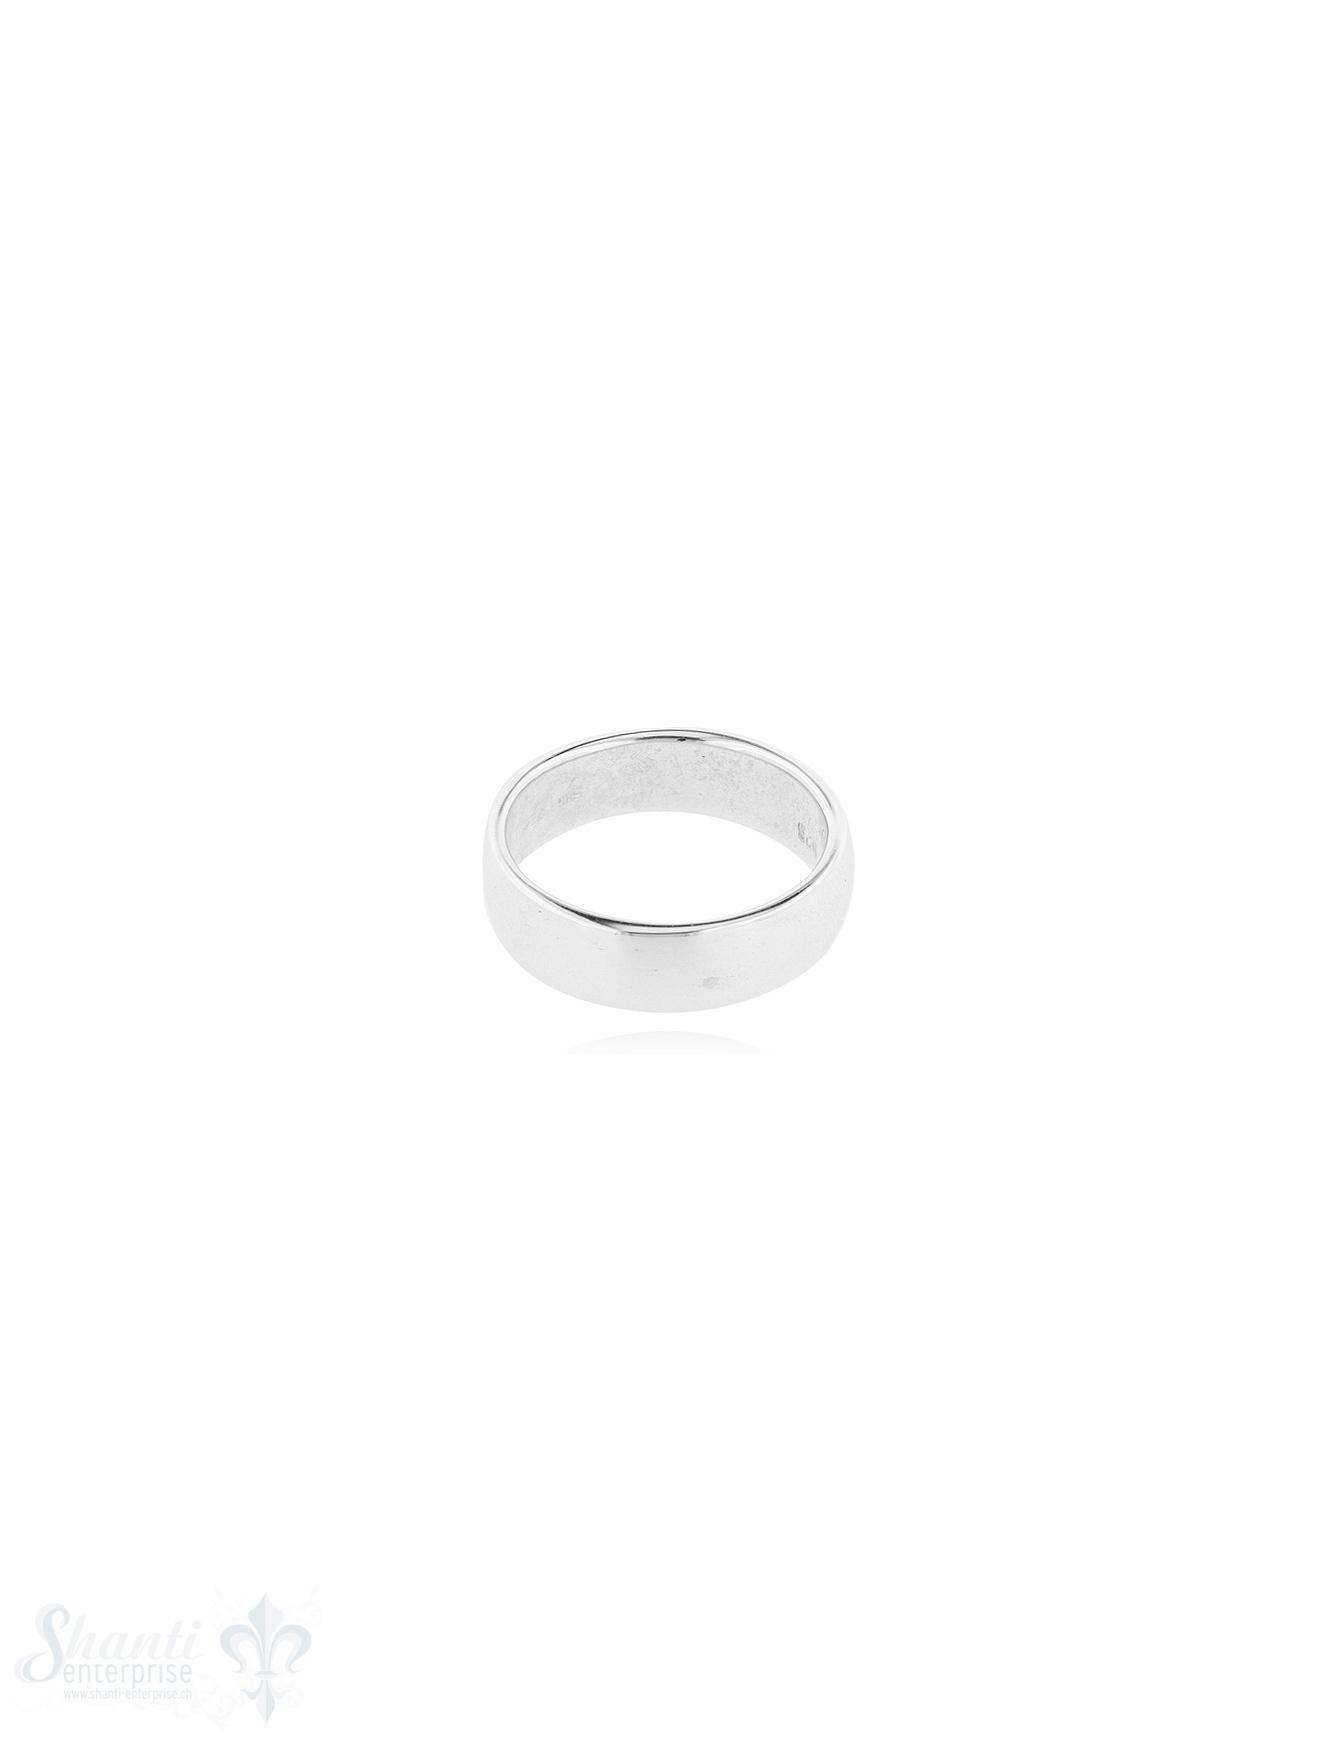 Silberring hell leicht gewölbt 5.6 mm breit